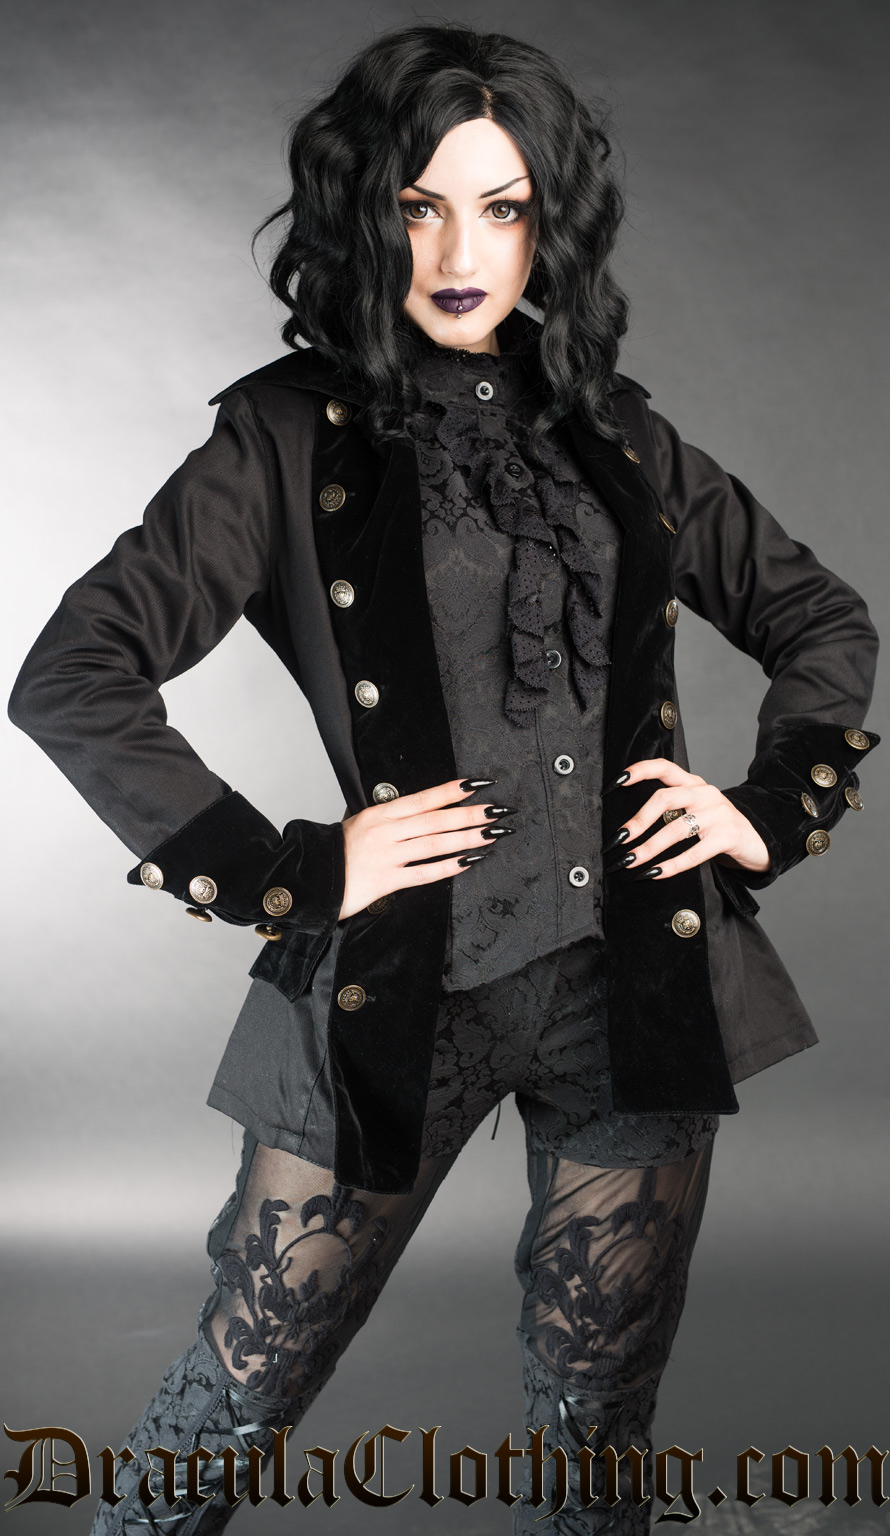 Black Female Pirate Jacket